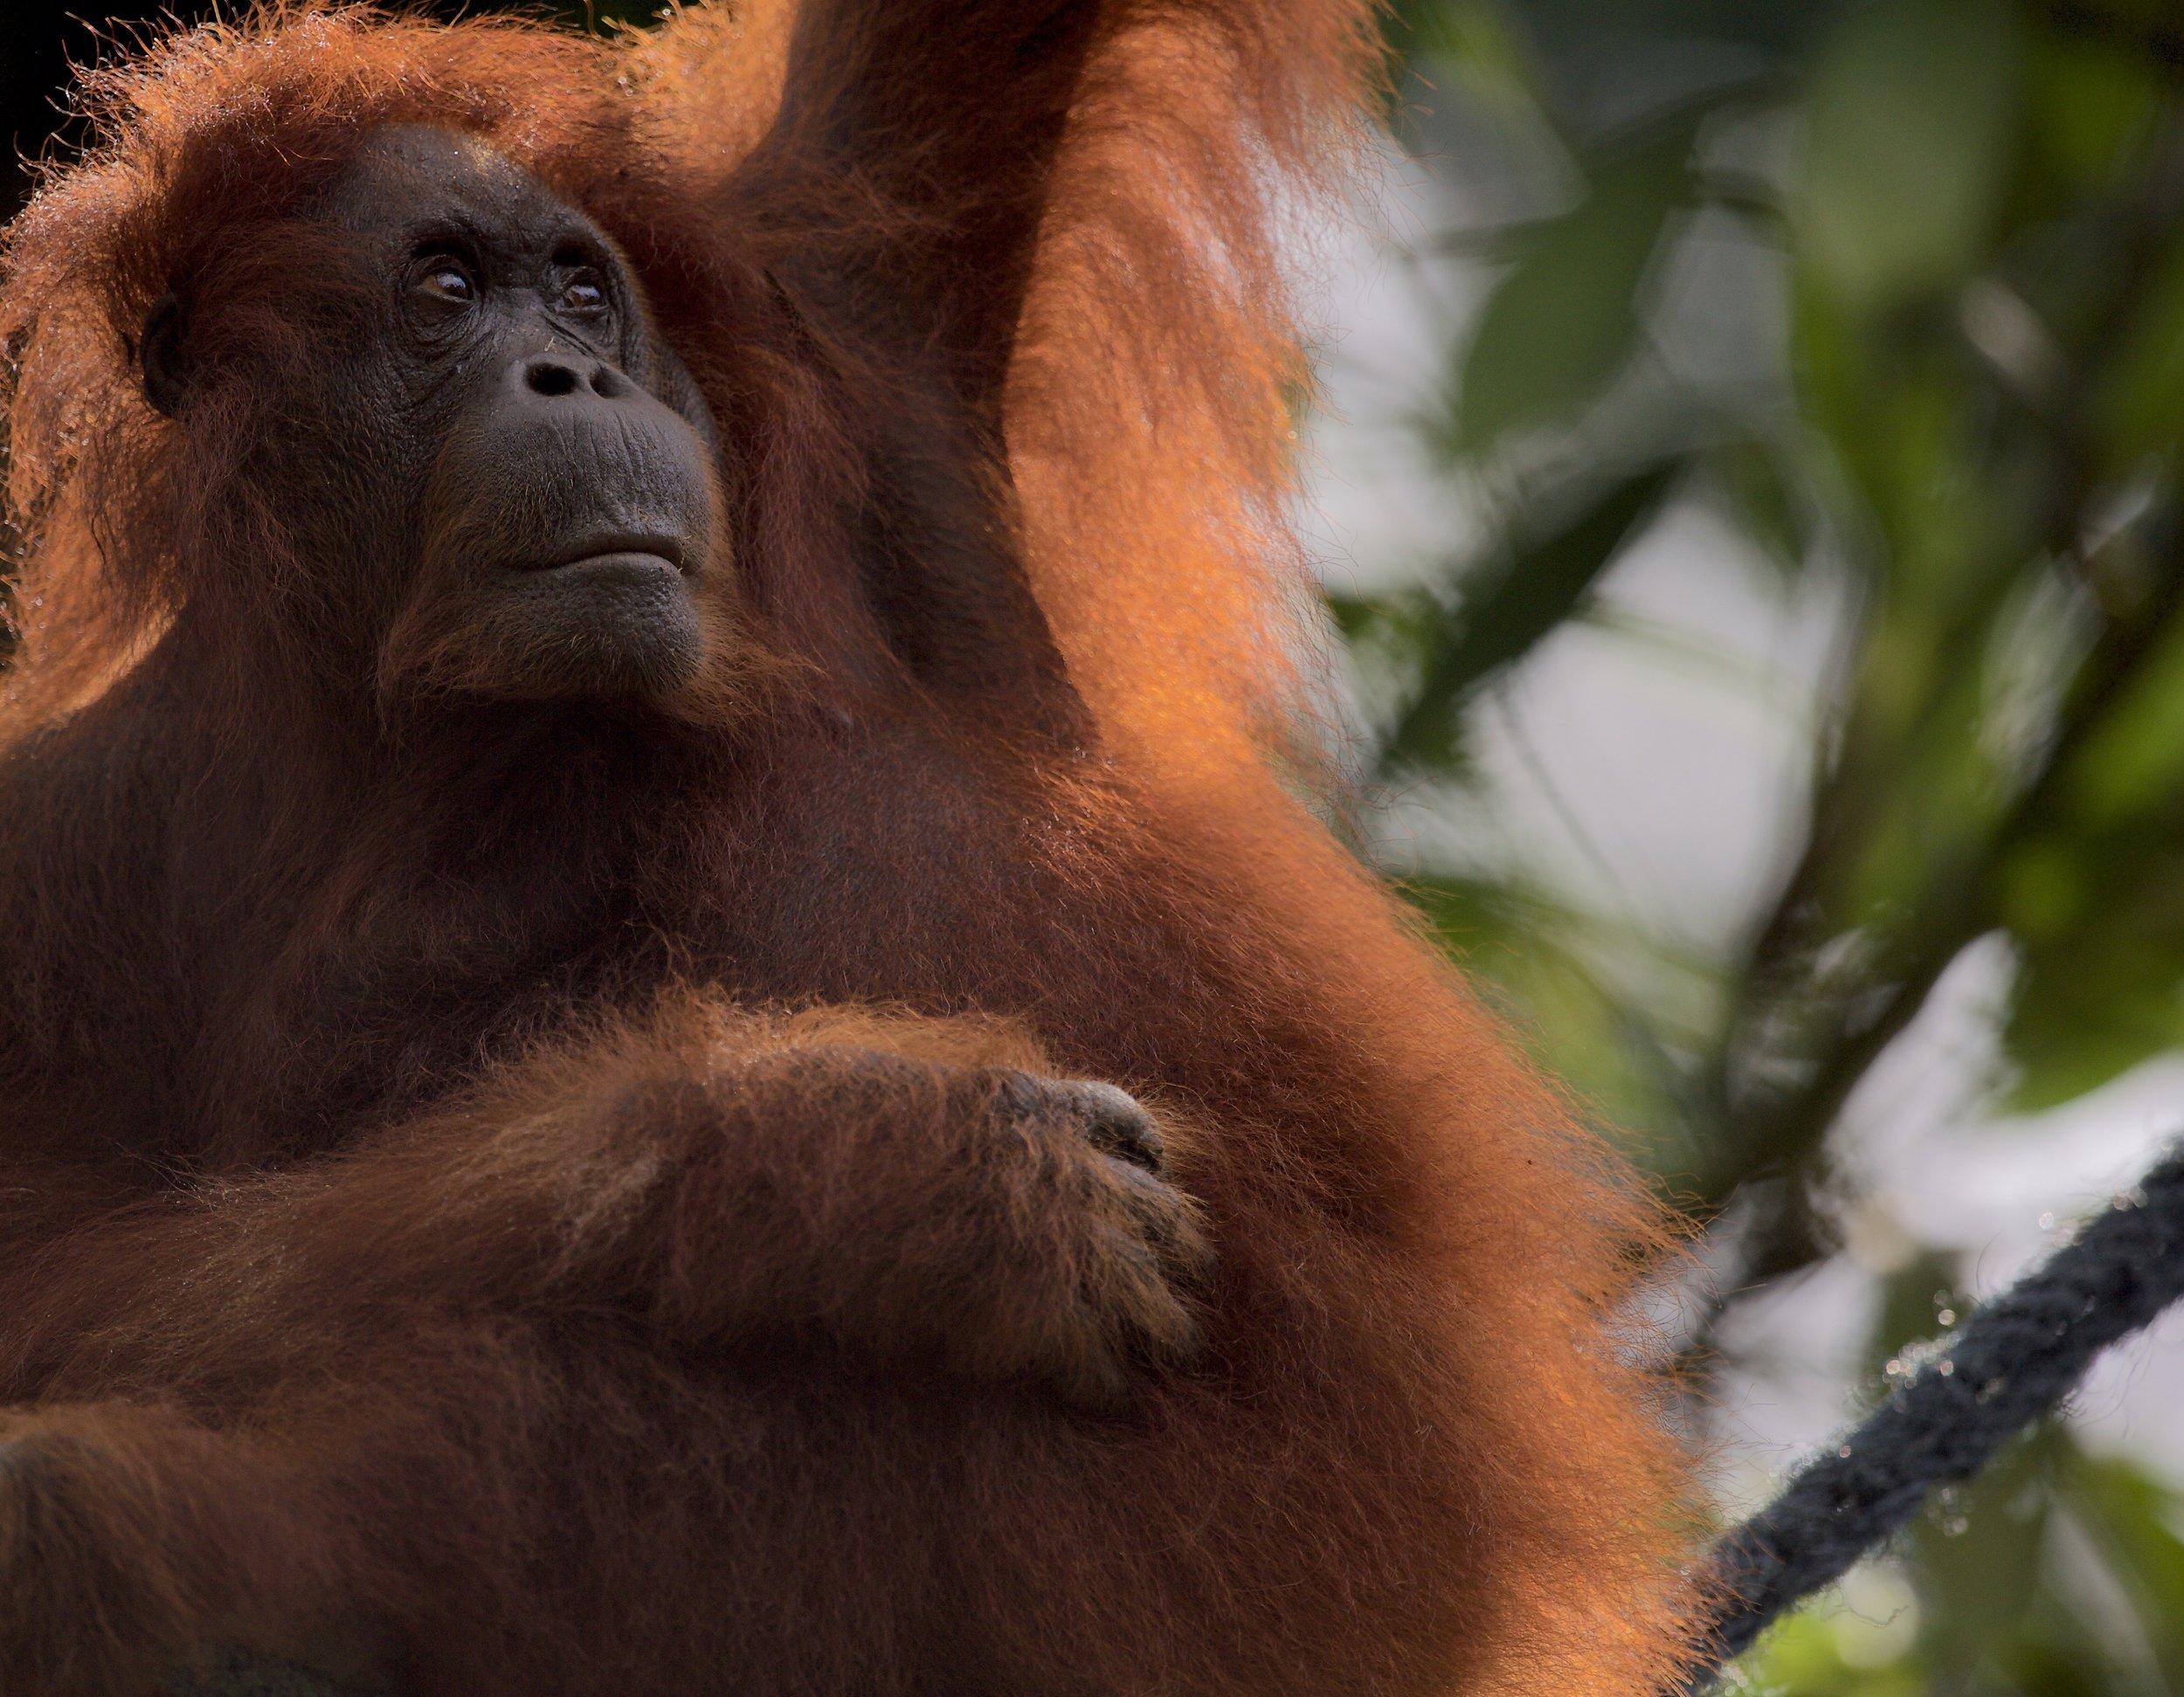 An orangutan on Borneo.